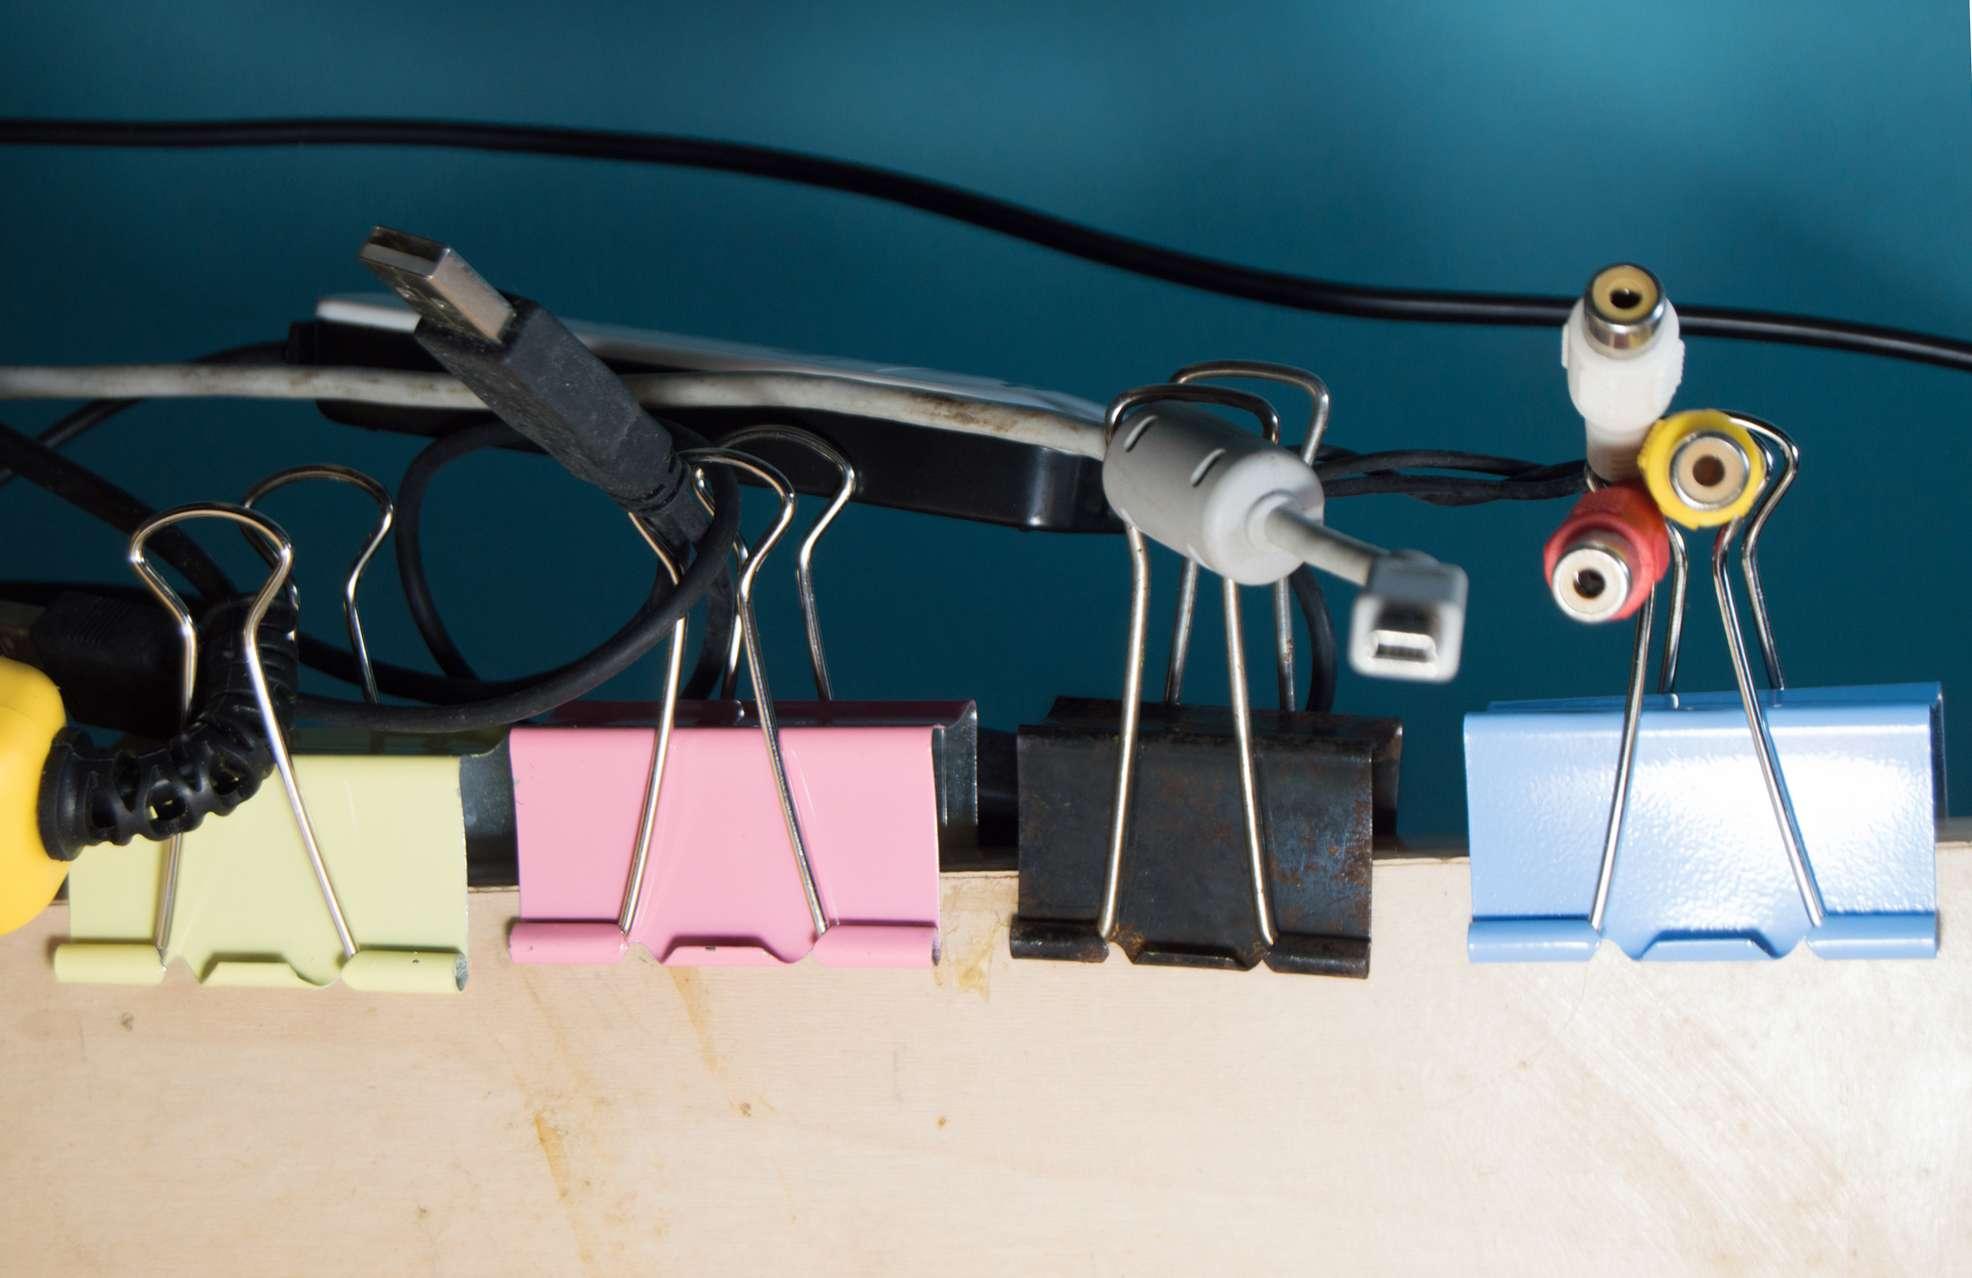 feeding cables through binder clips